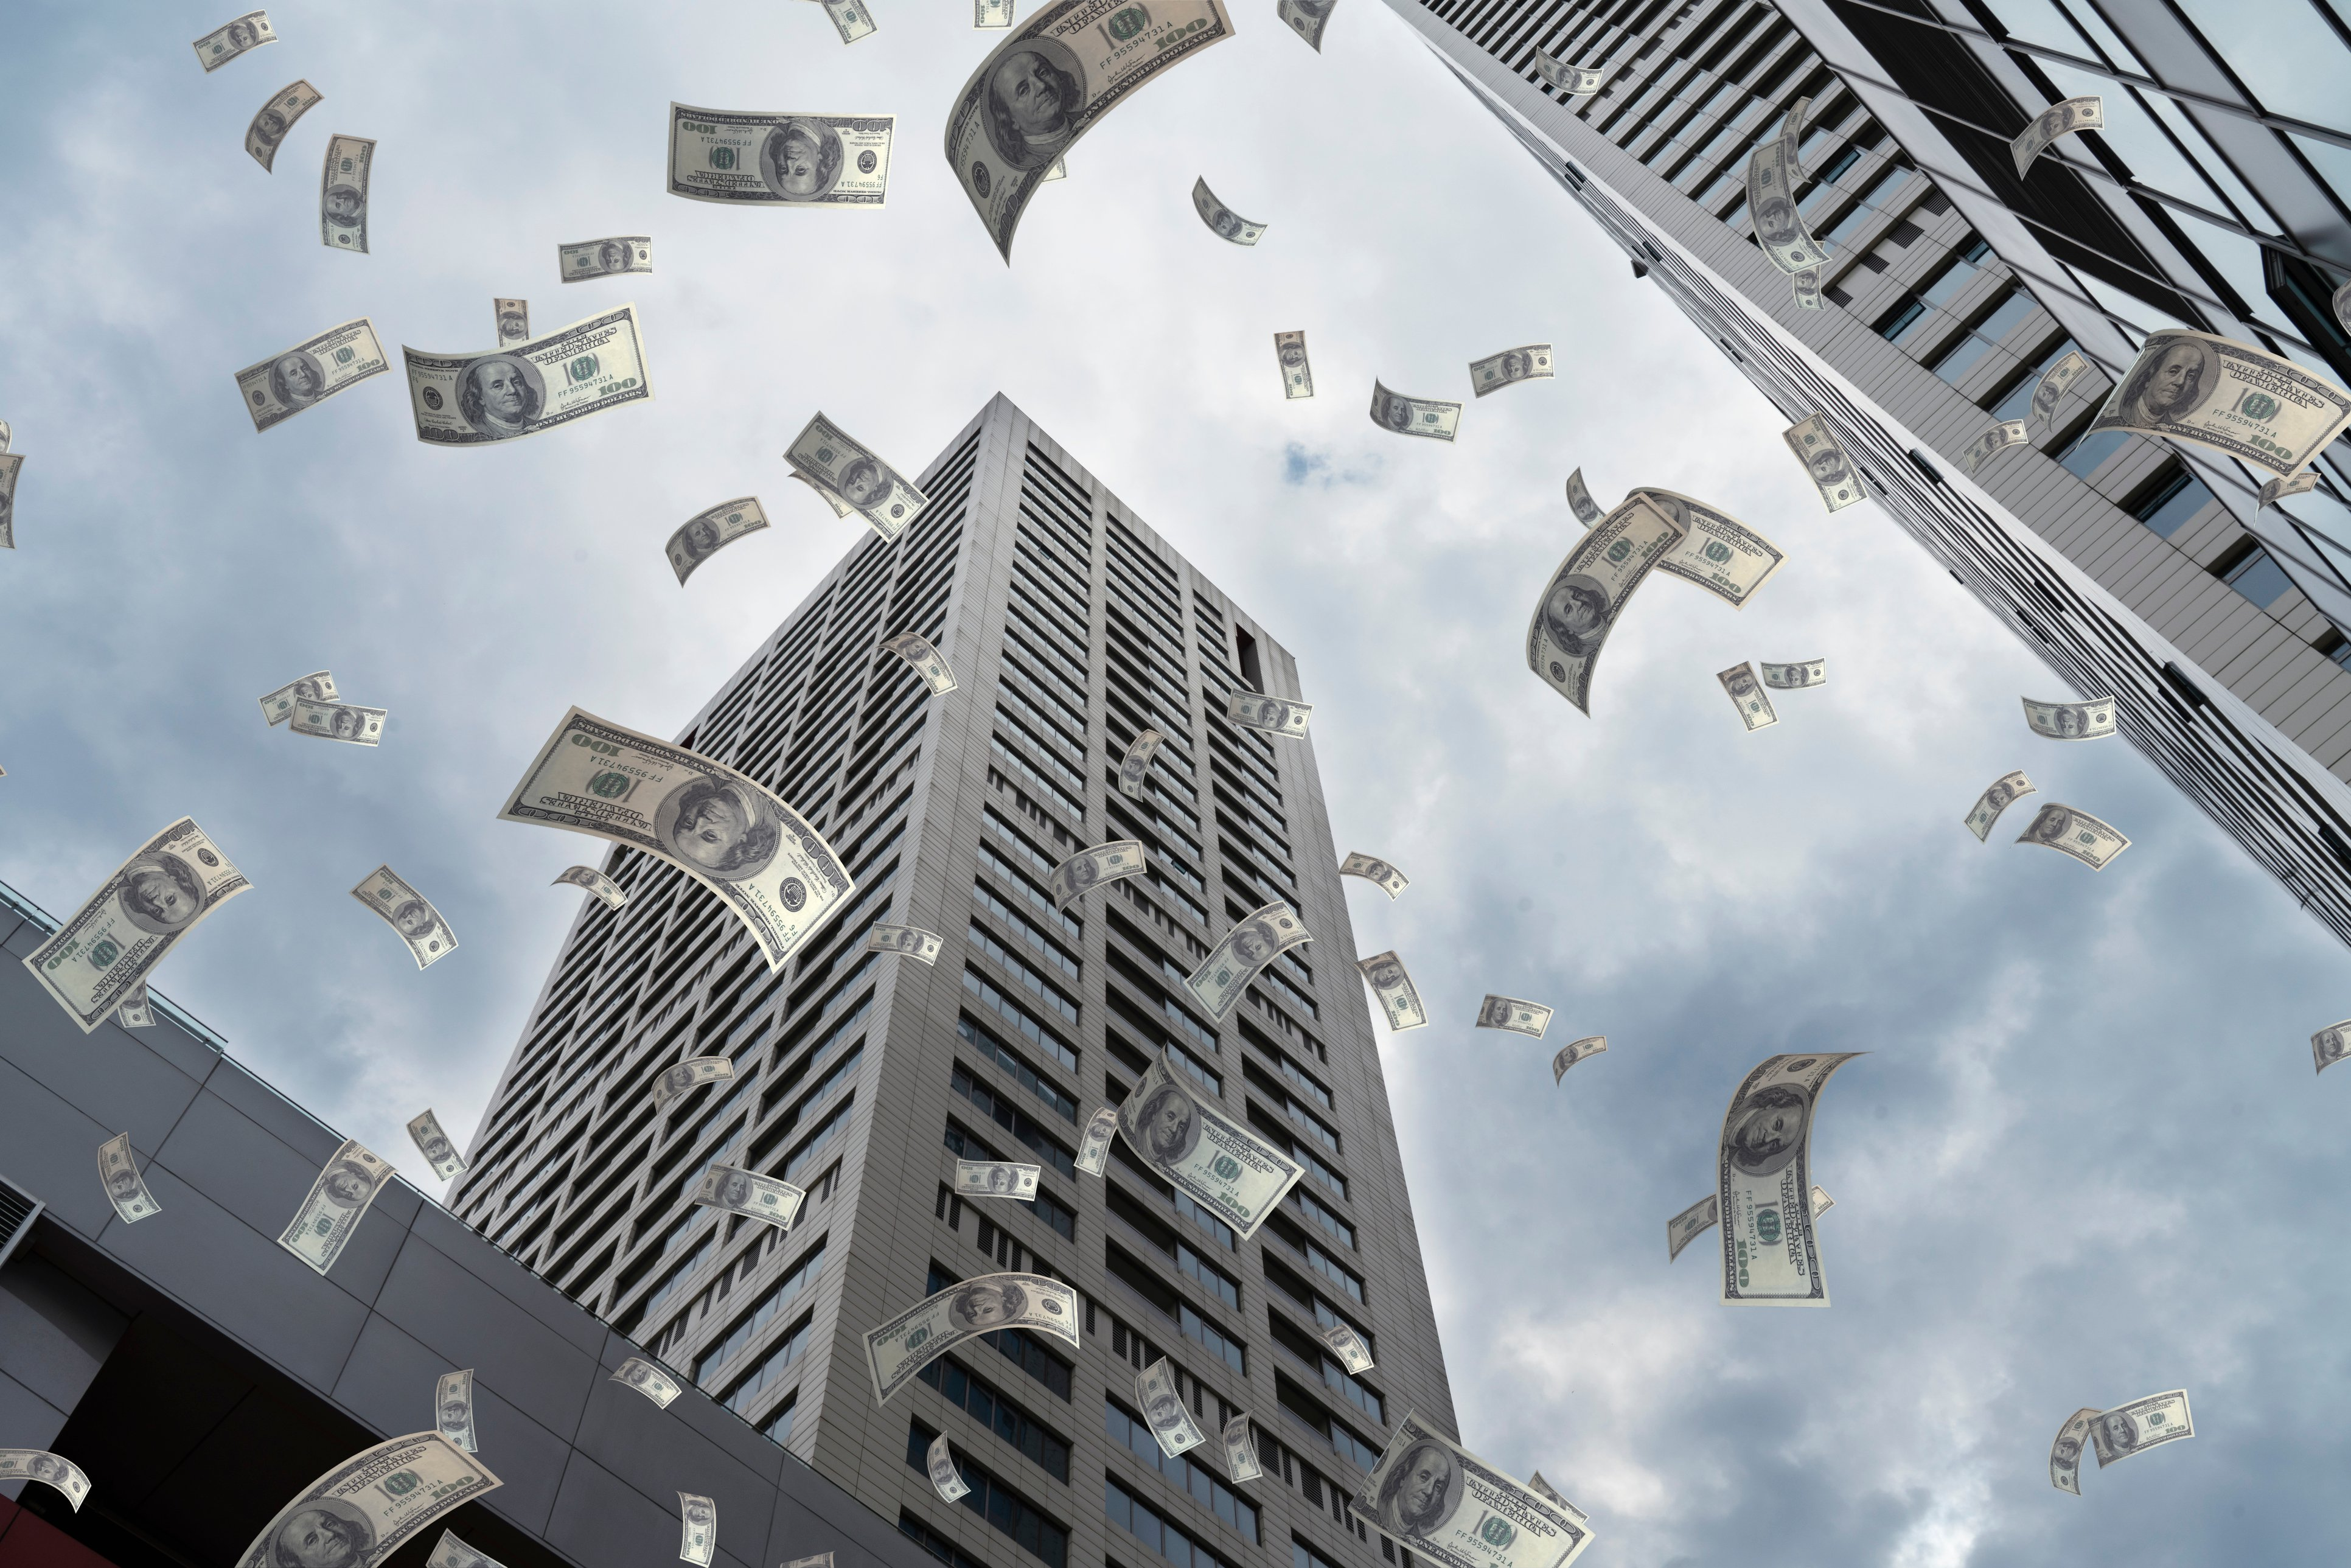 Pluie de billets de dollars sur la banque